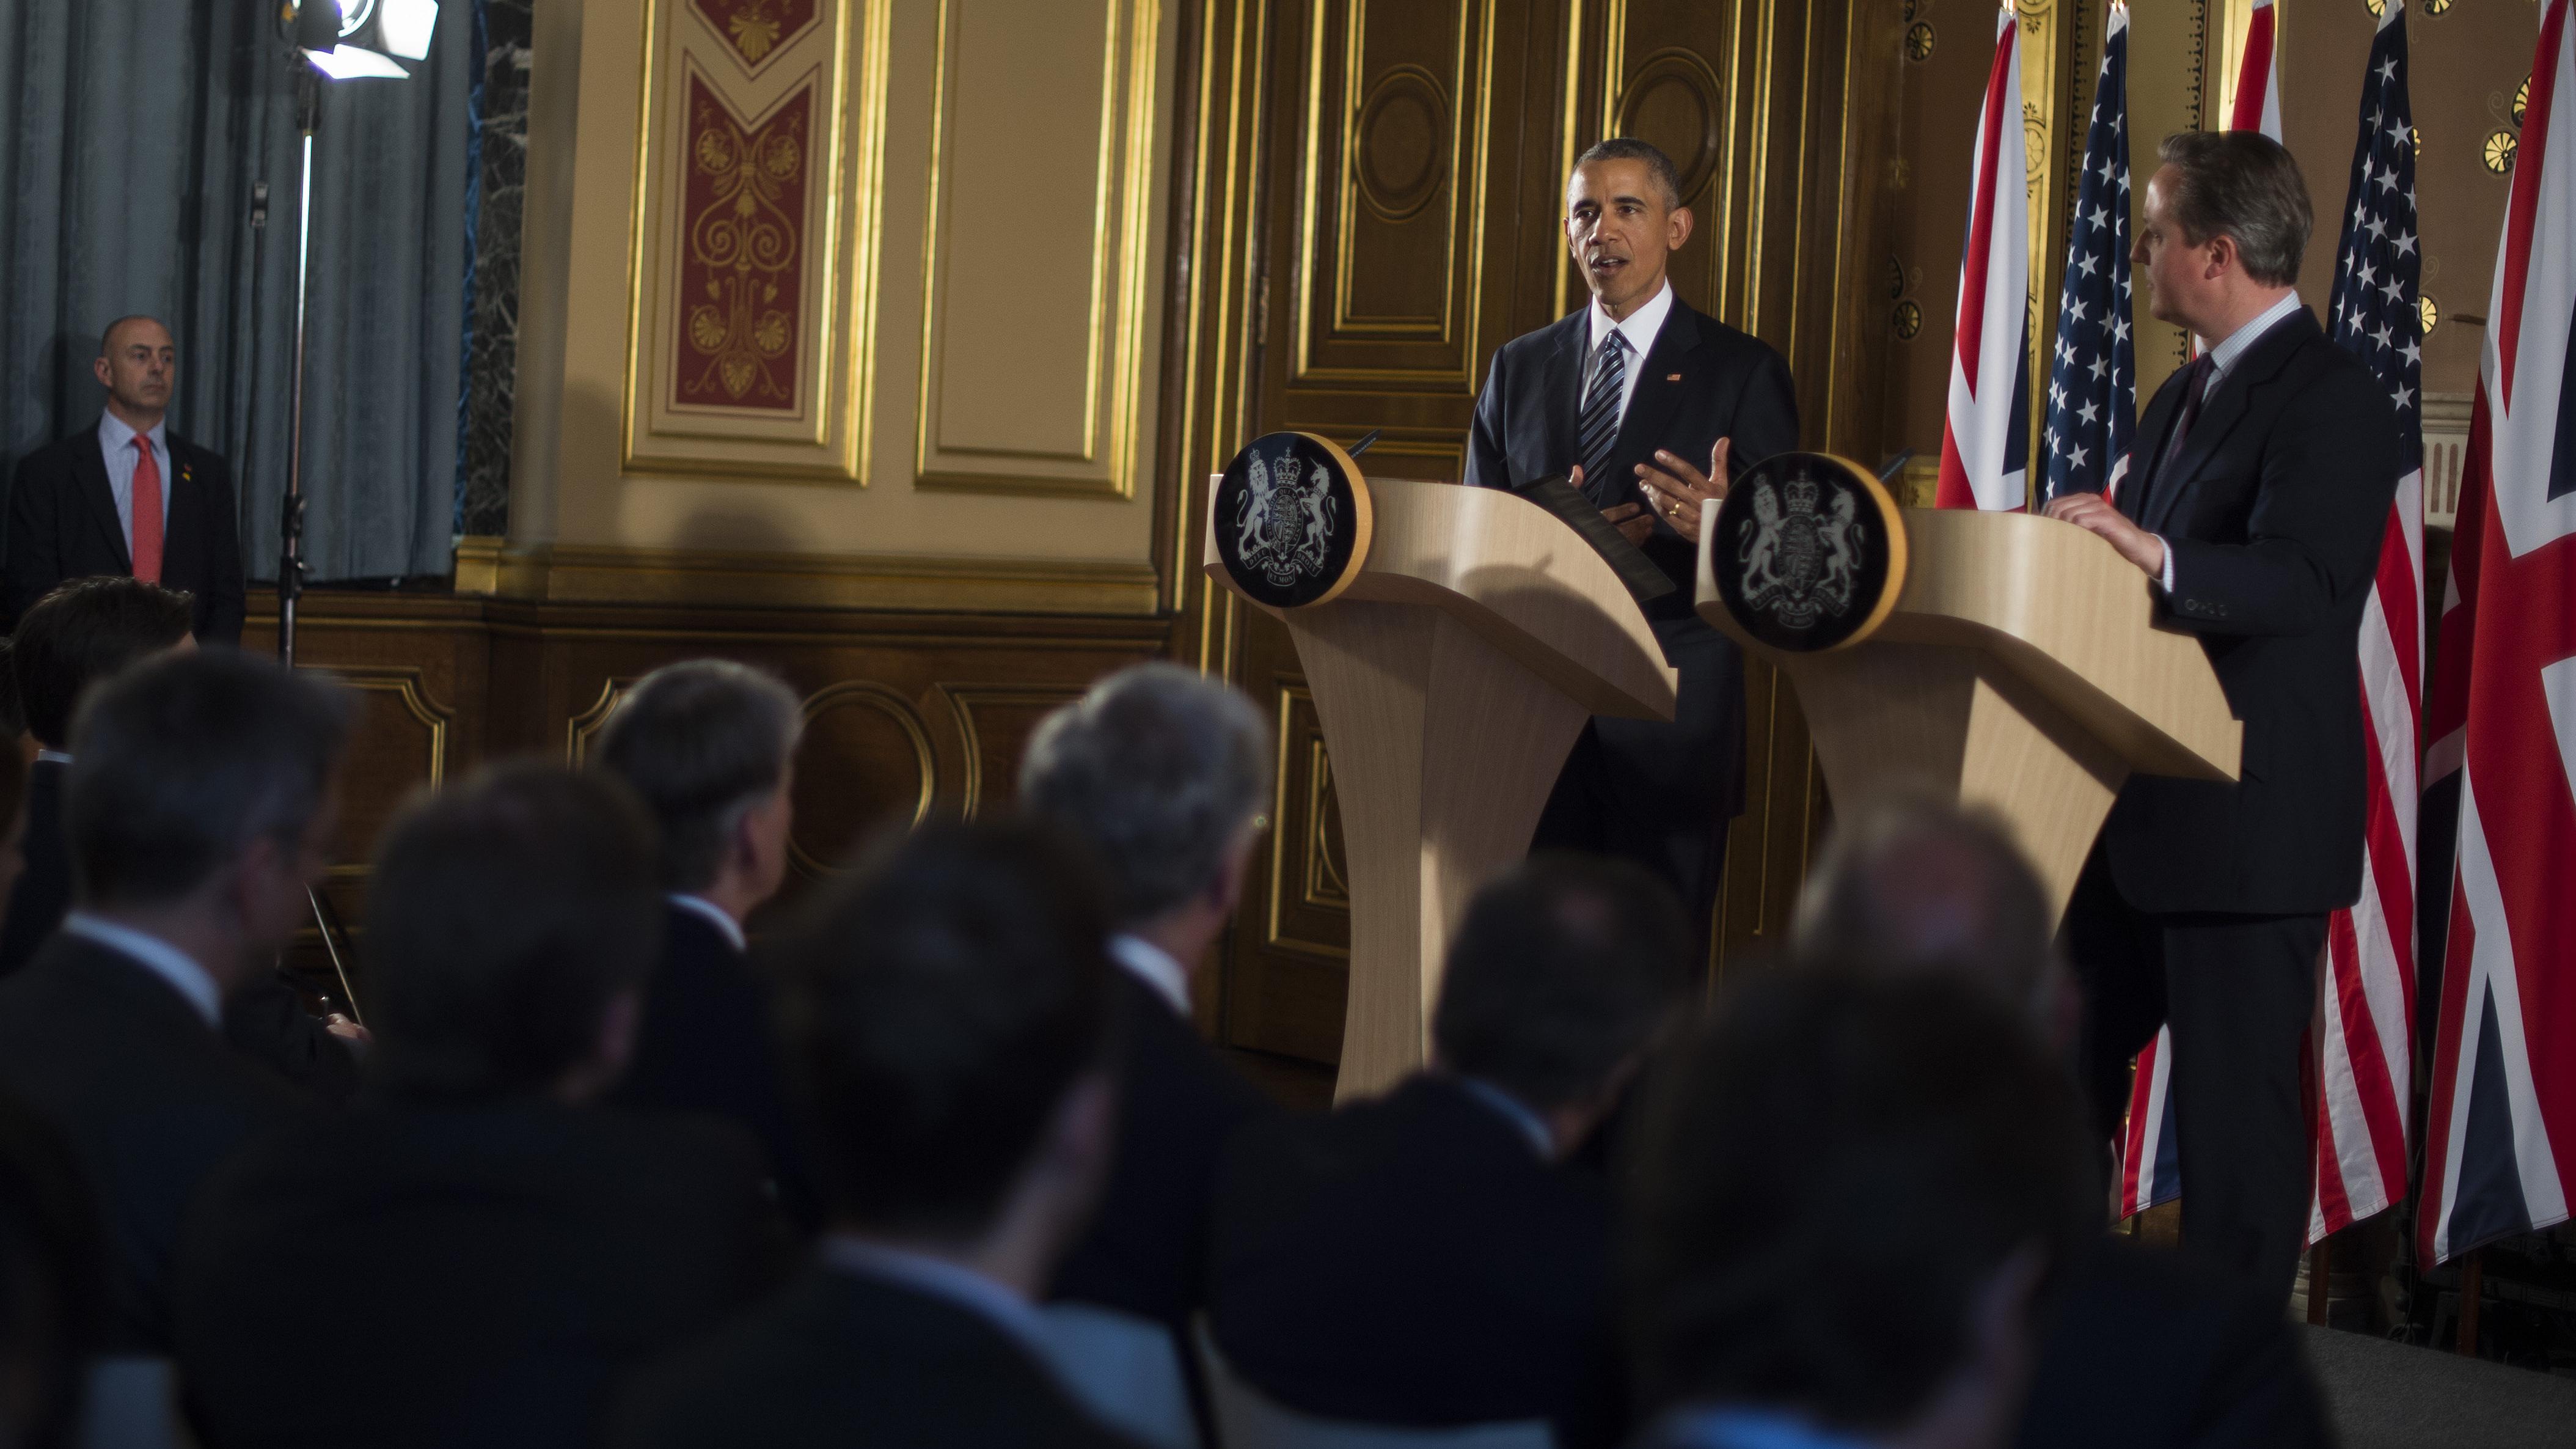 Like Everyone Else, Obama Woke Up Friday Morning And Played Prince's 'Purple Rain'